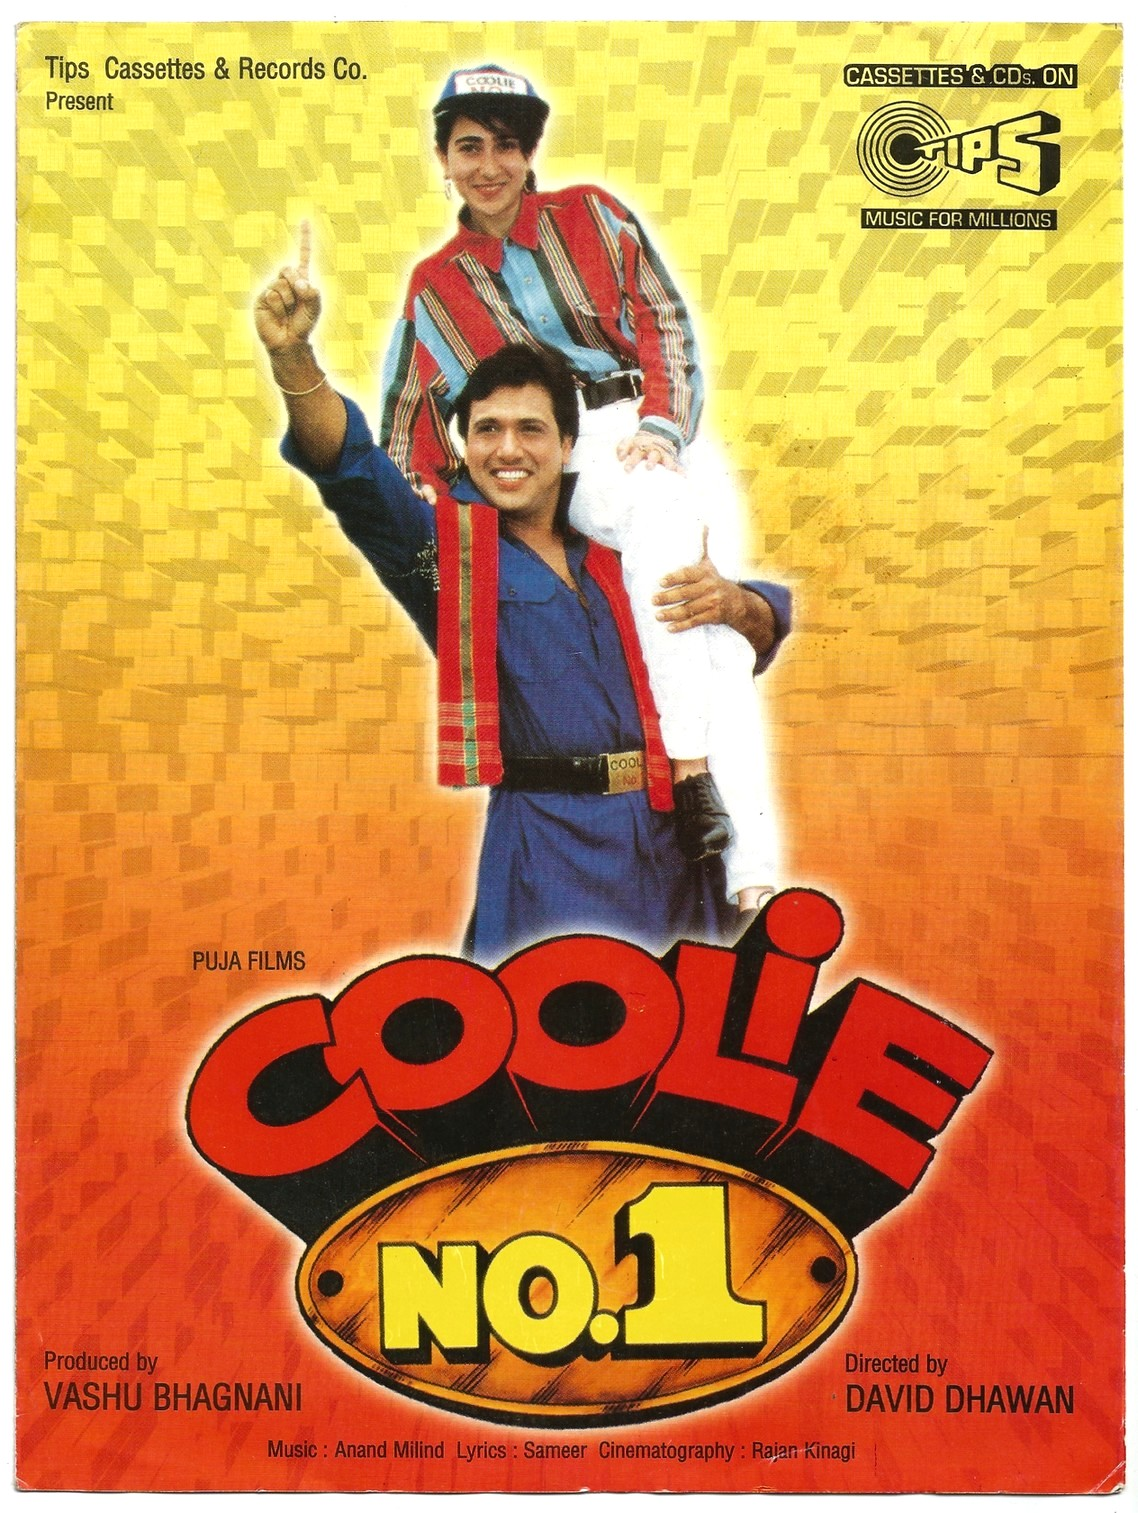 Image result for coolie no 1